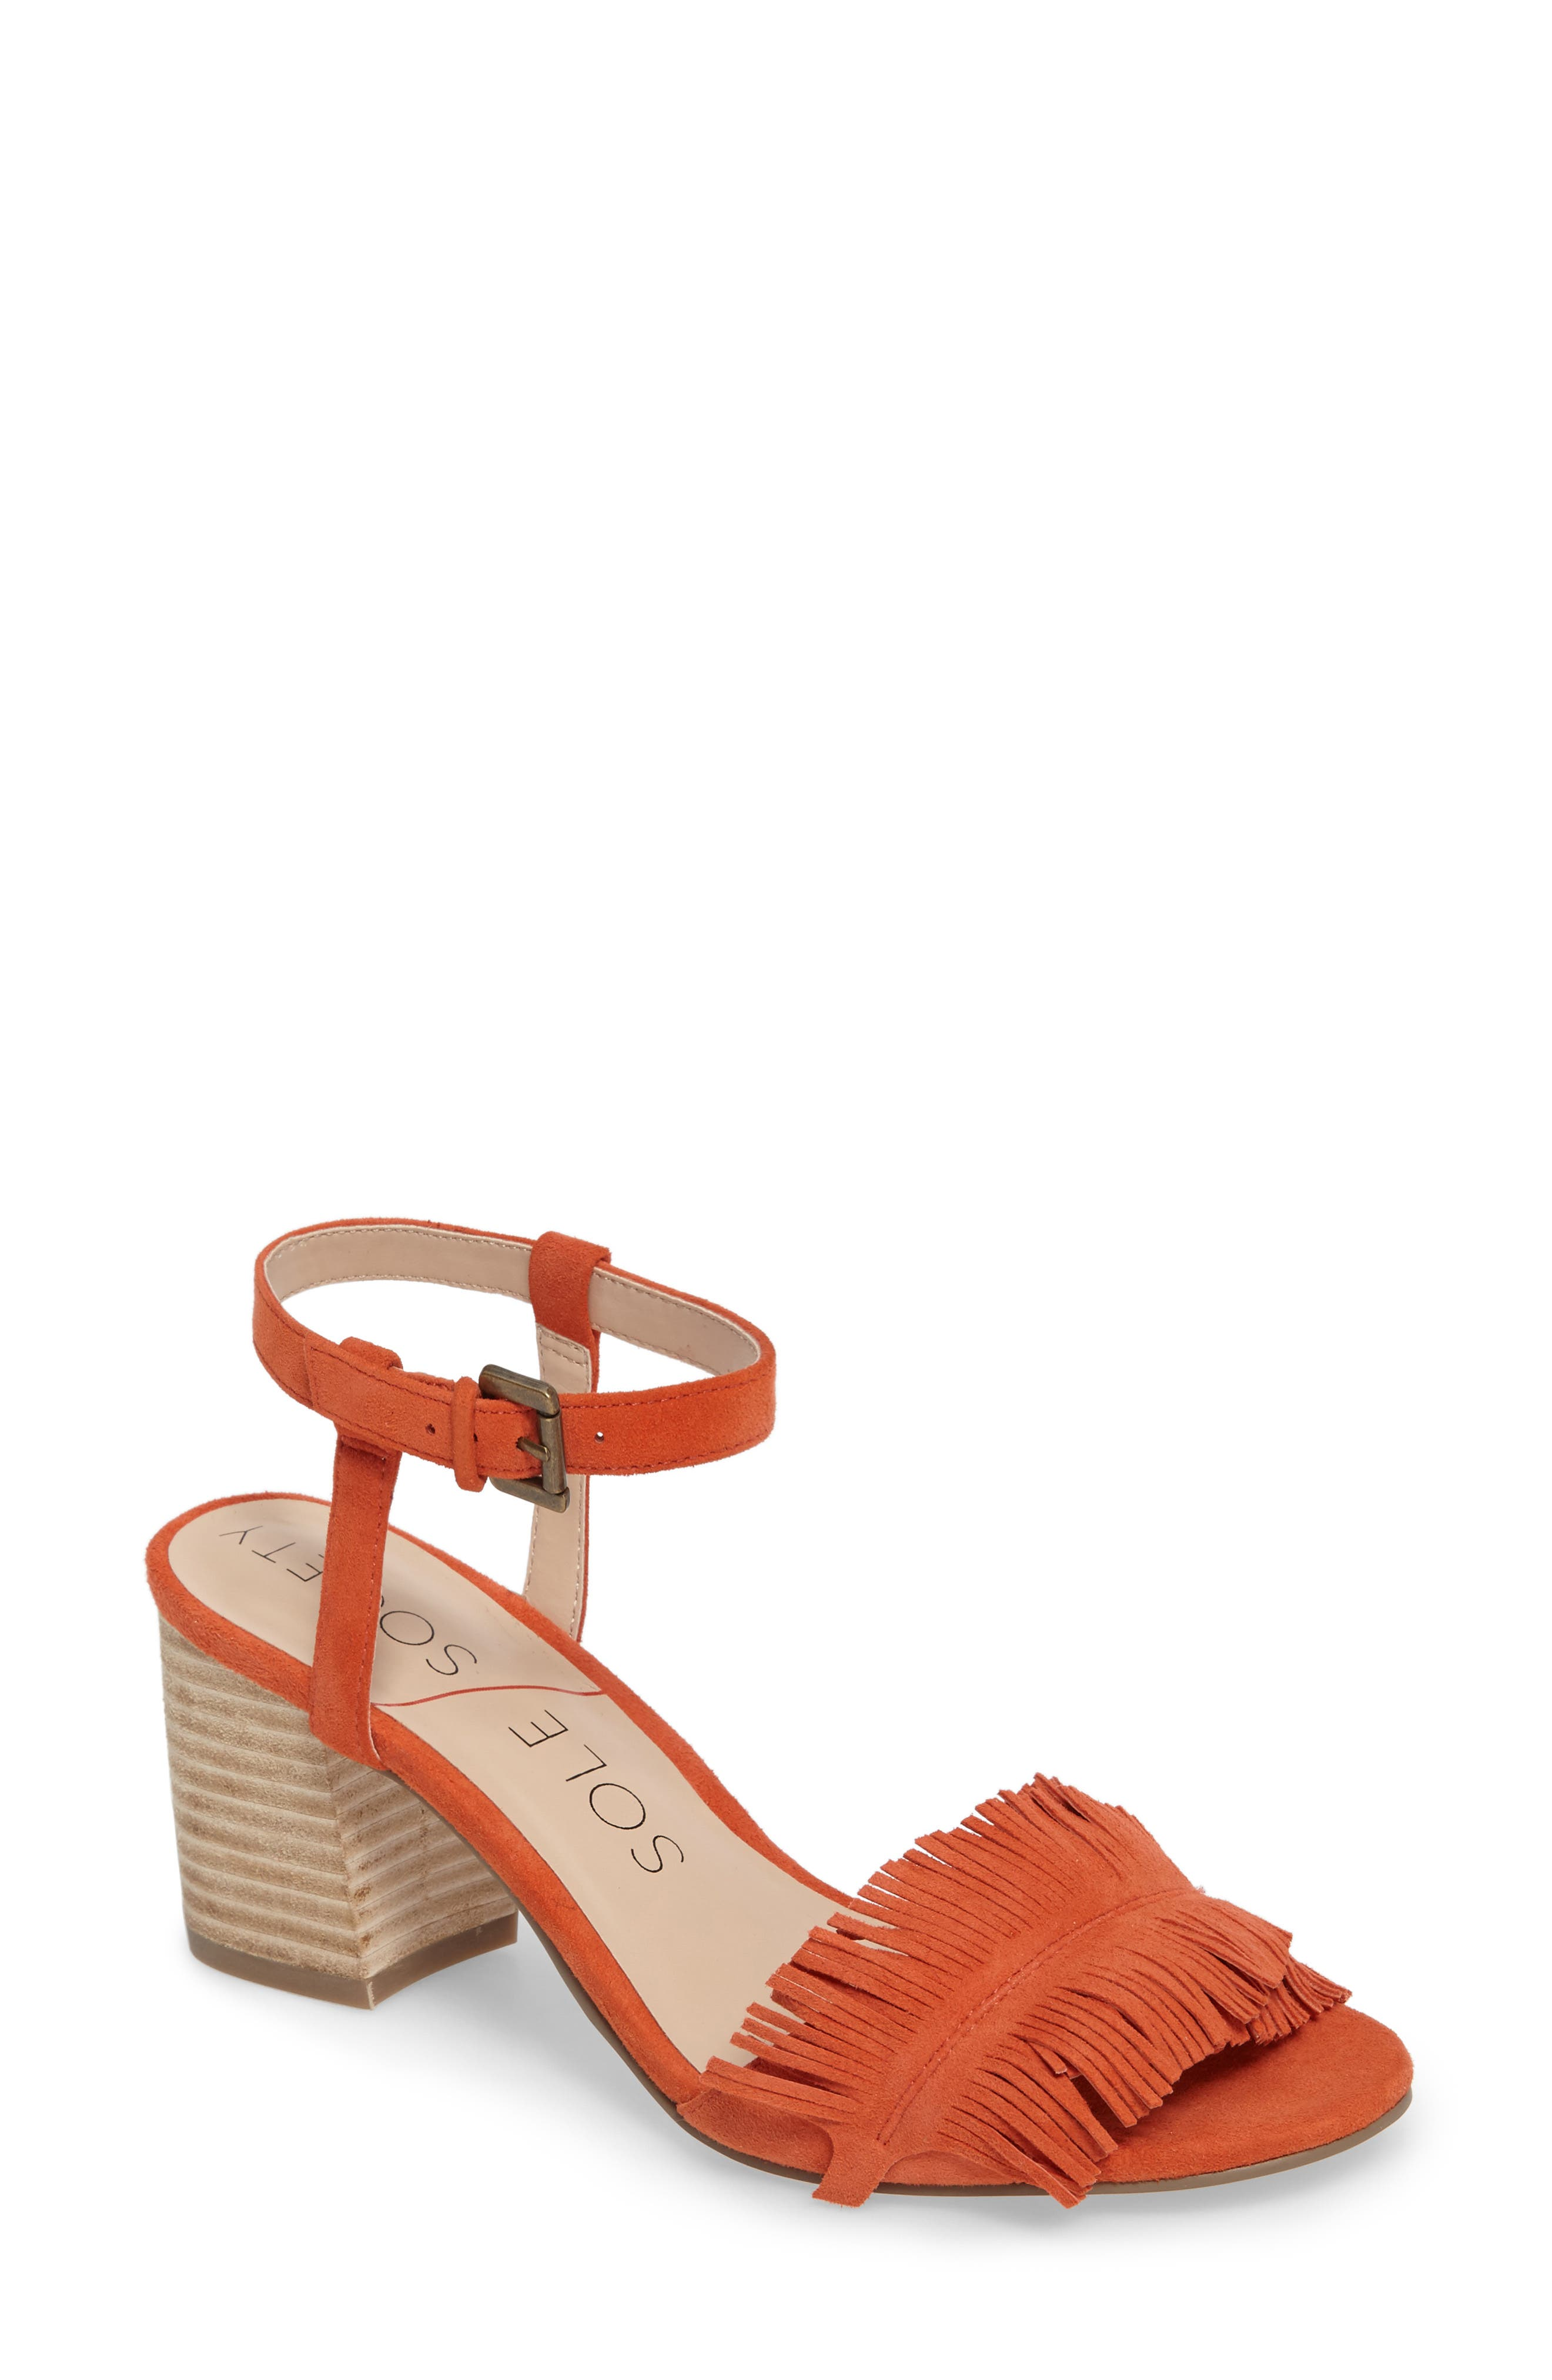 Alternate Image 1 Selected - Sole Society Sepia Fringe Sandal (Women)